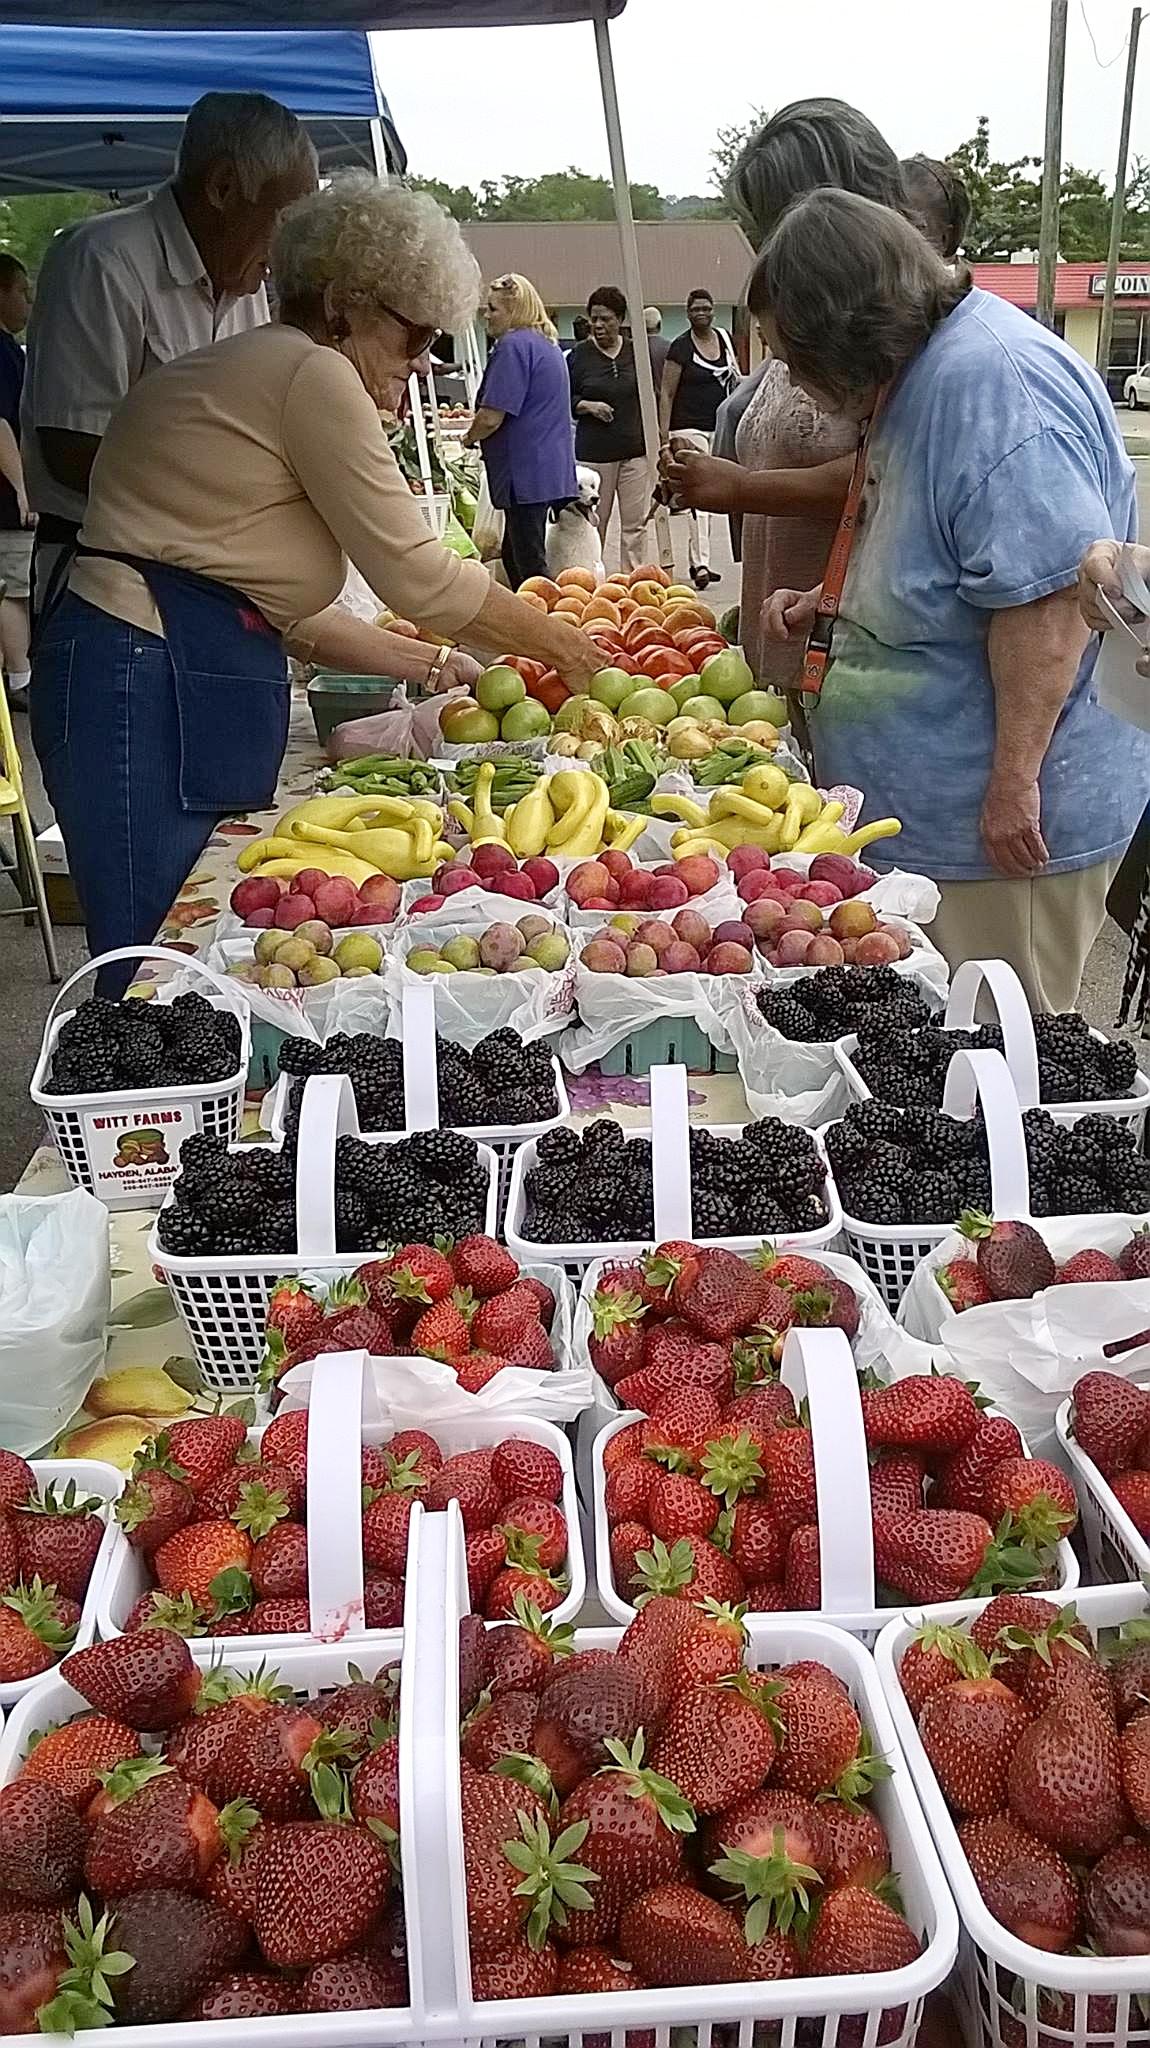 The East Lake Farmers Market, 7753 1st Avenue South at East Lake United Methodist Church